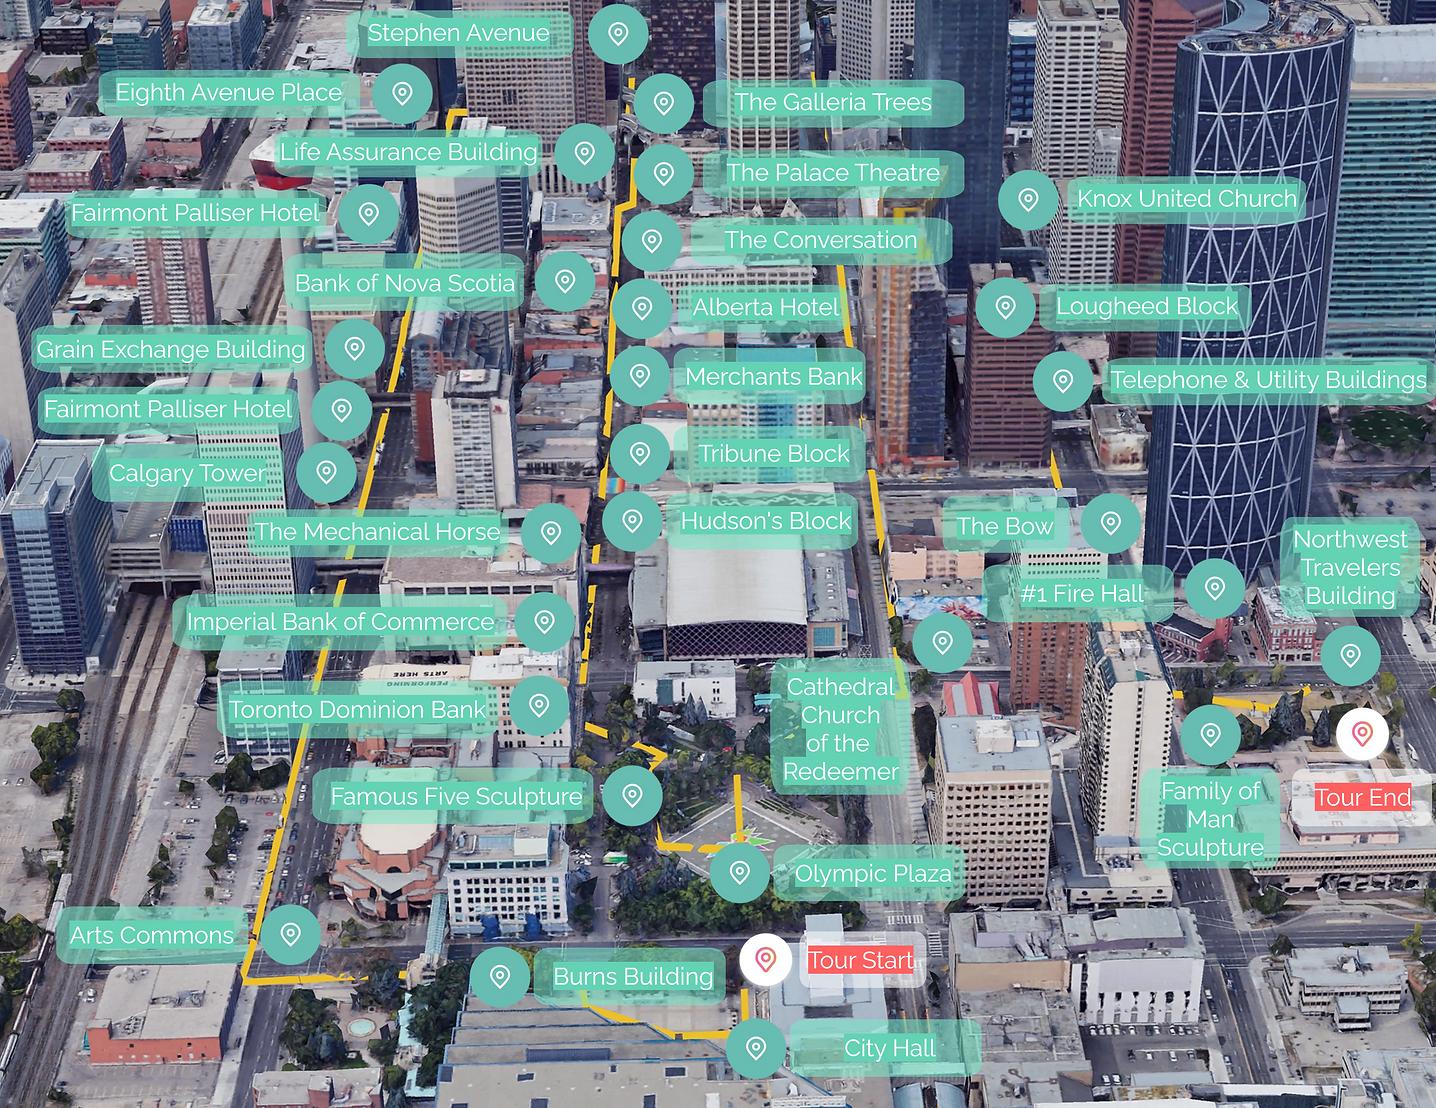 map of downtown calgary audio tour